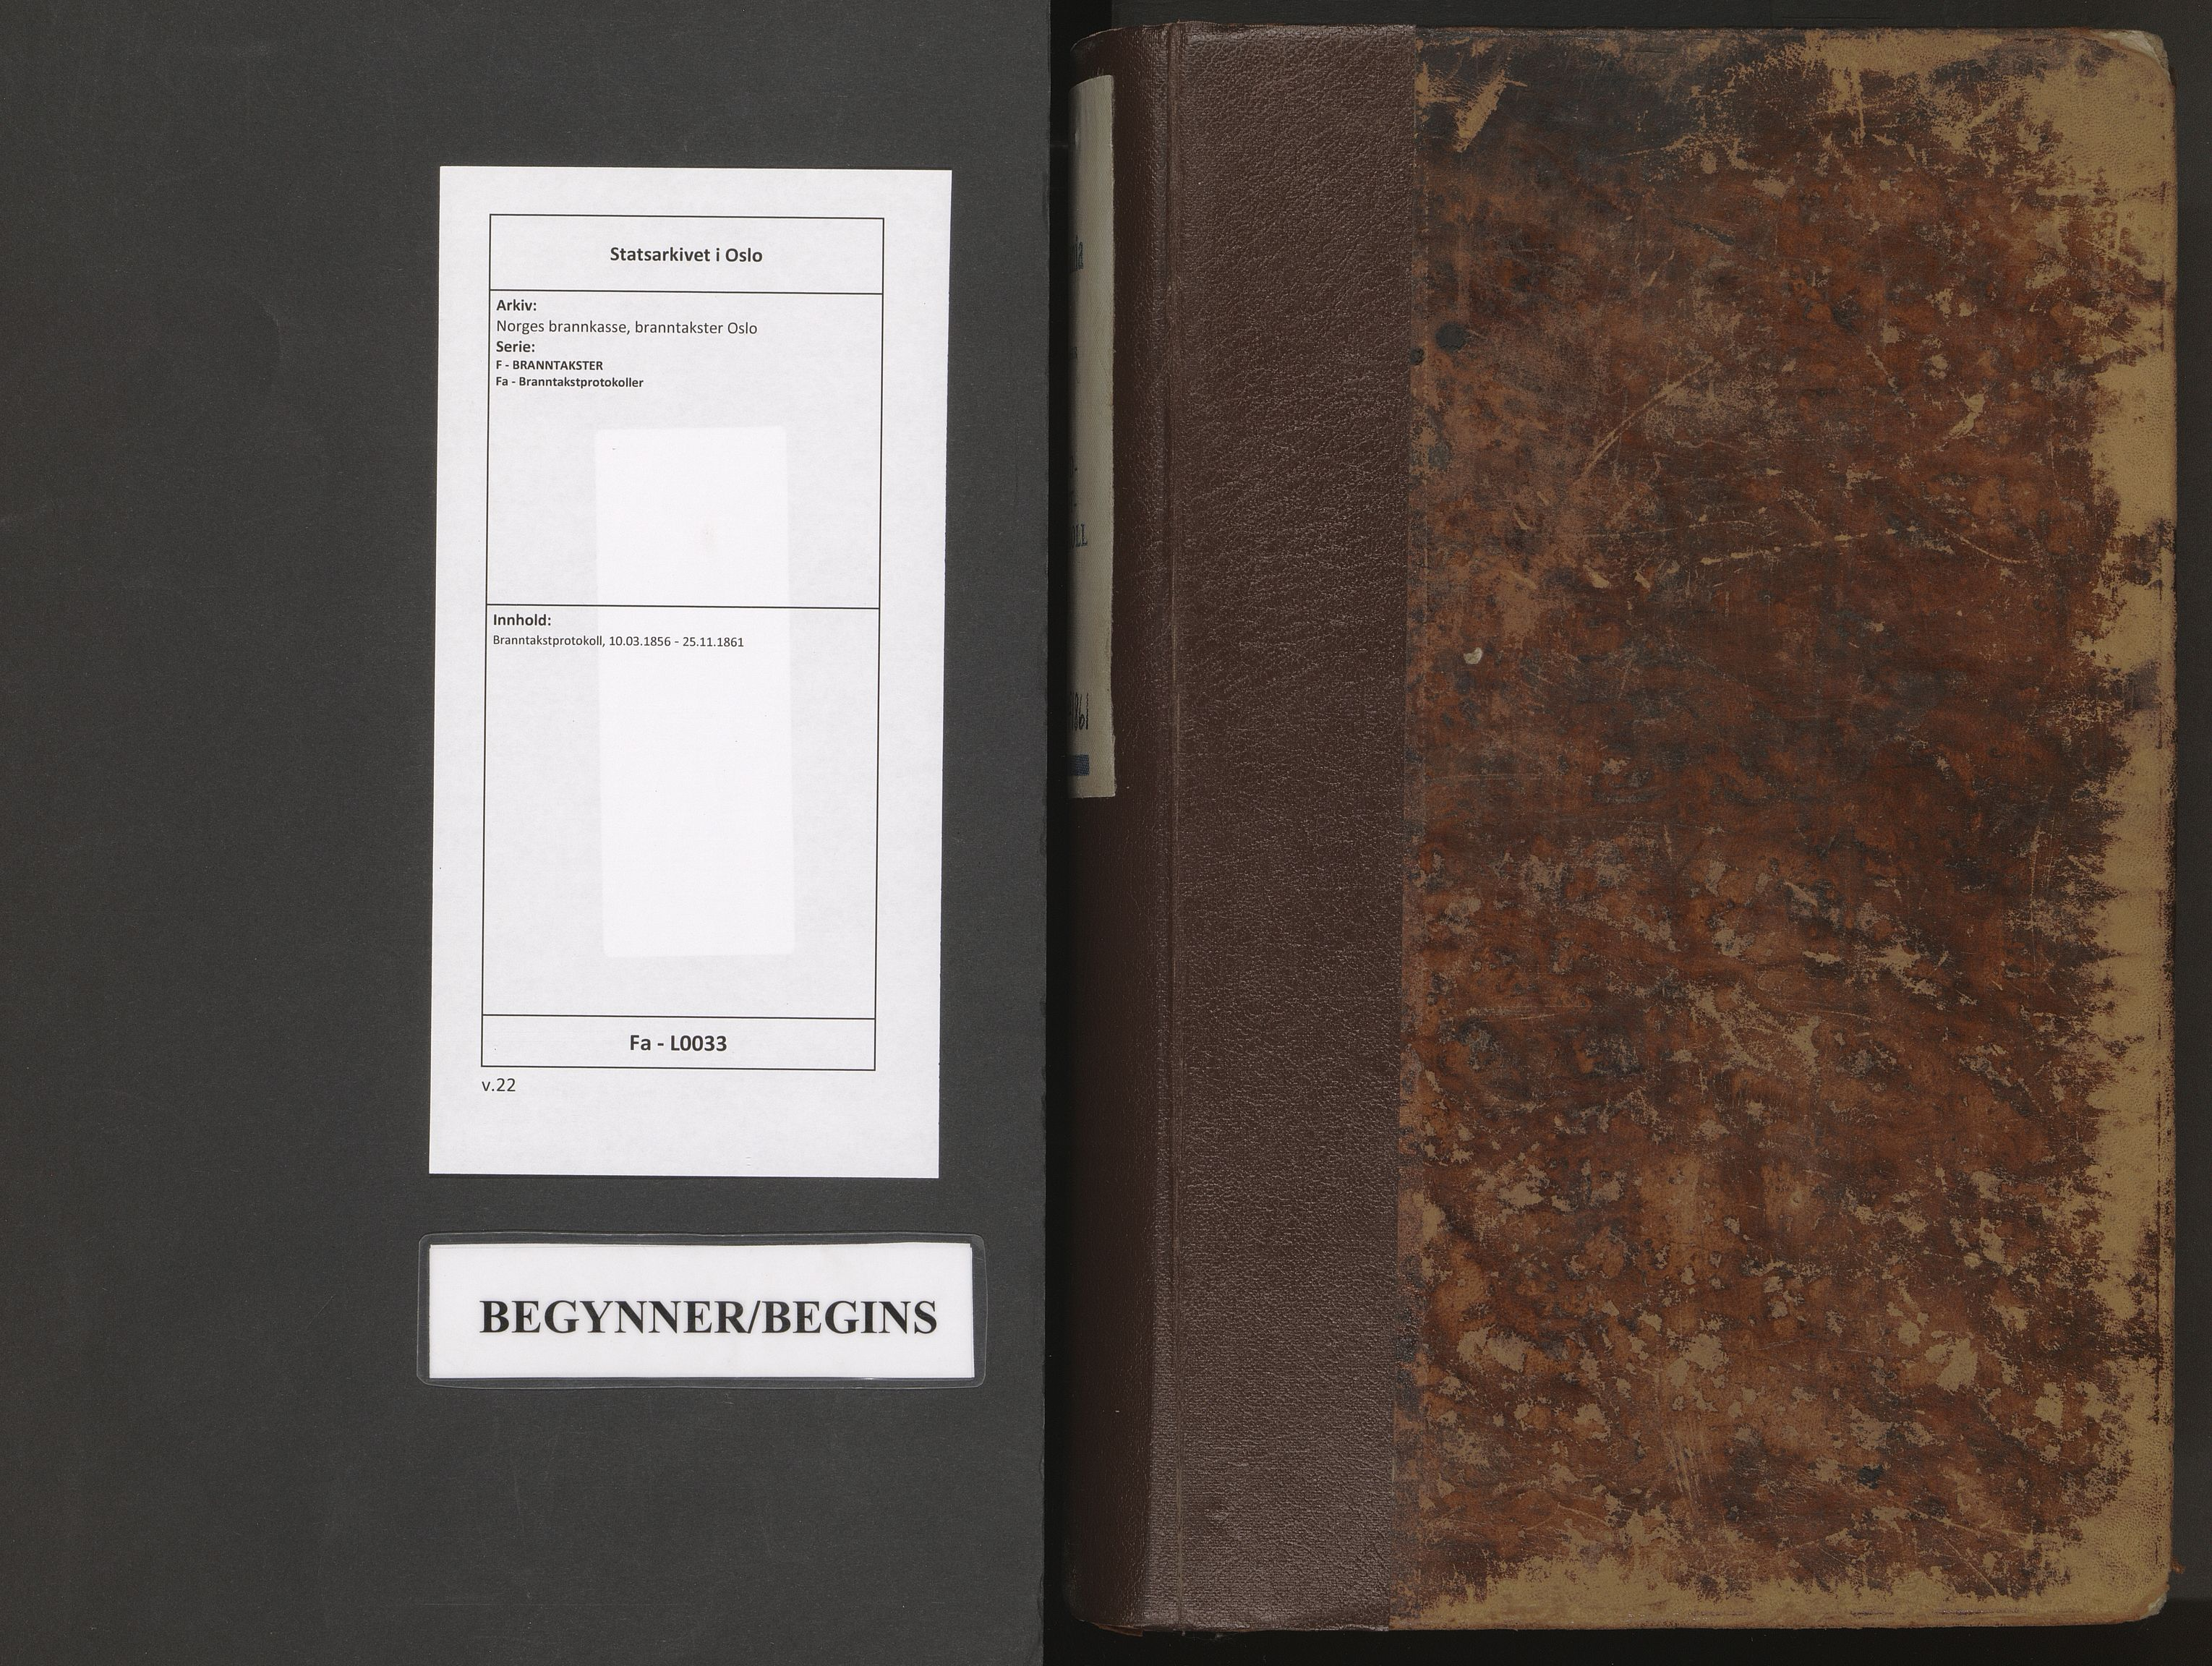 SAO, Norges brannkasse, branntakster Oslo, F/Fa/L0033: Branntakstprotokoll, 1856-1861